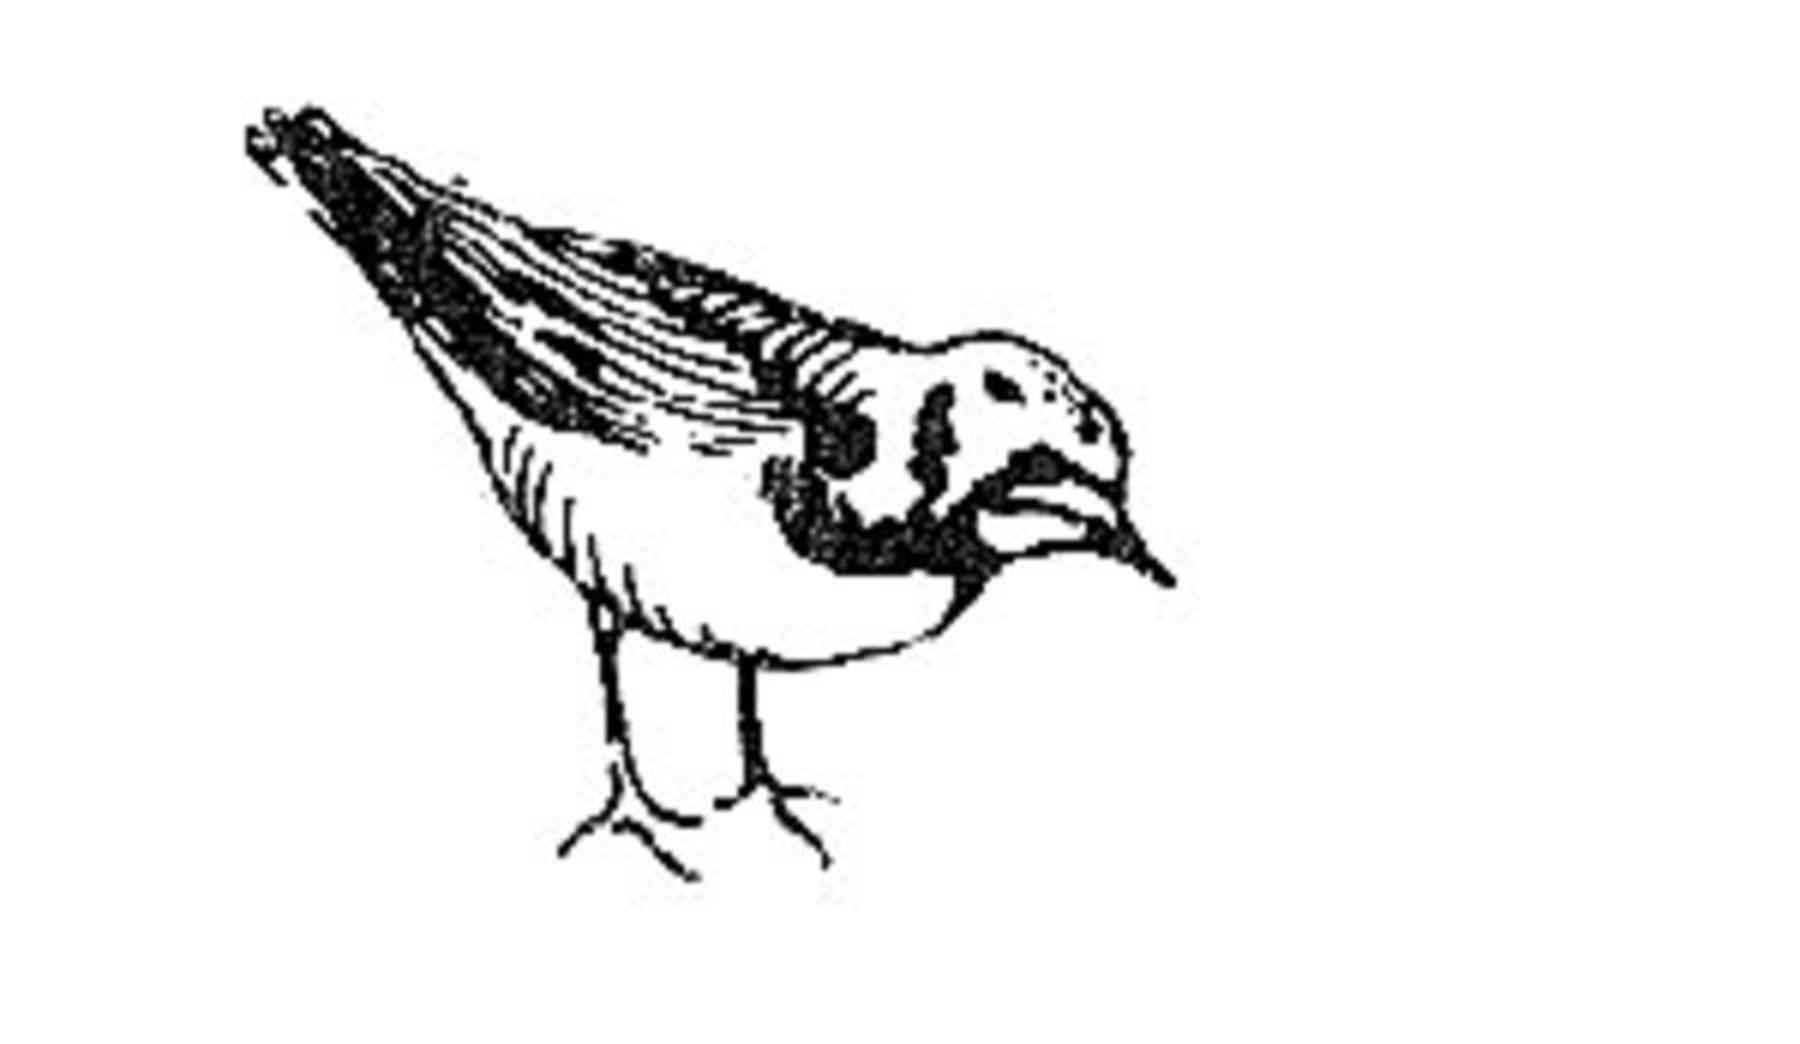 Arenaria interpres black and white illustration